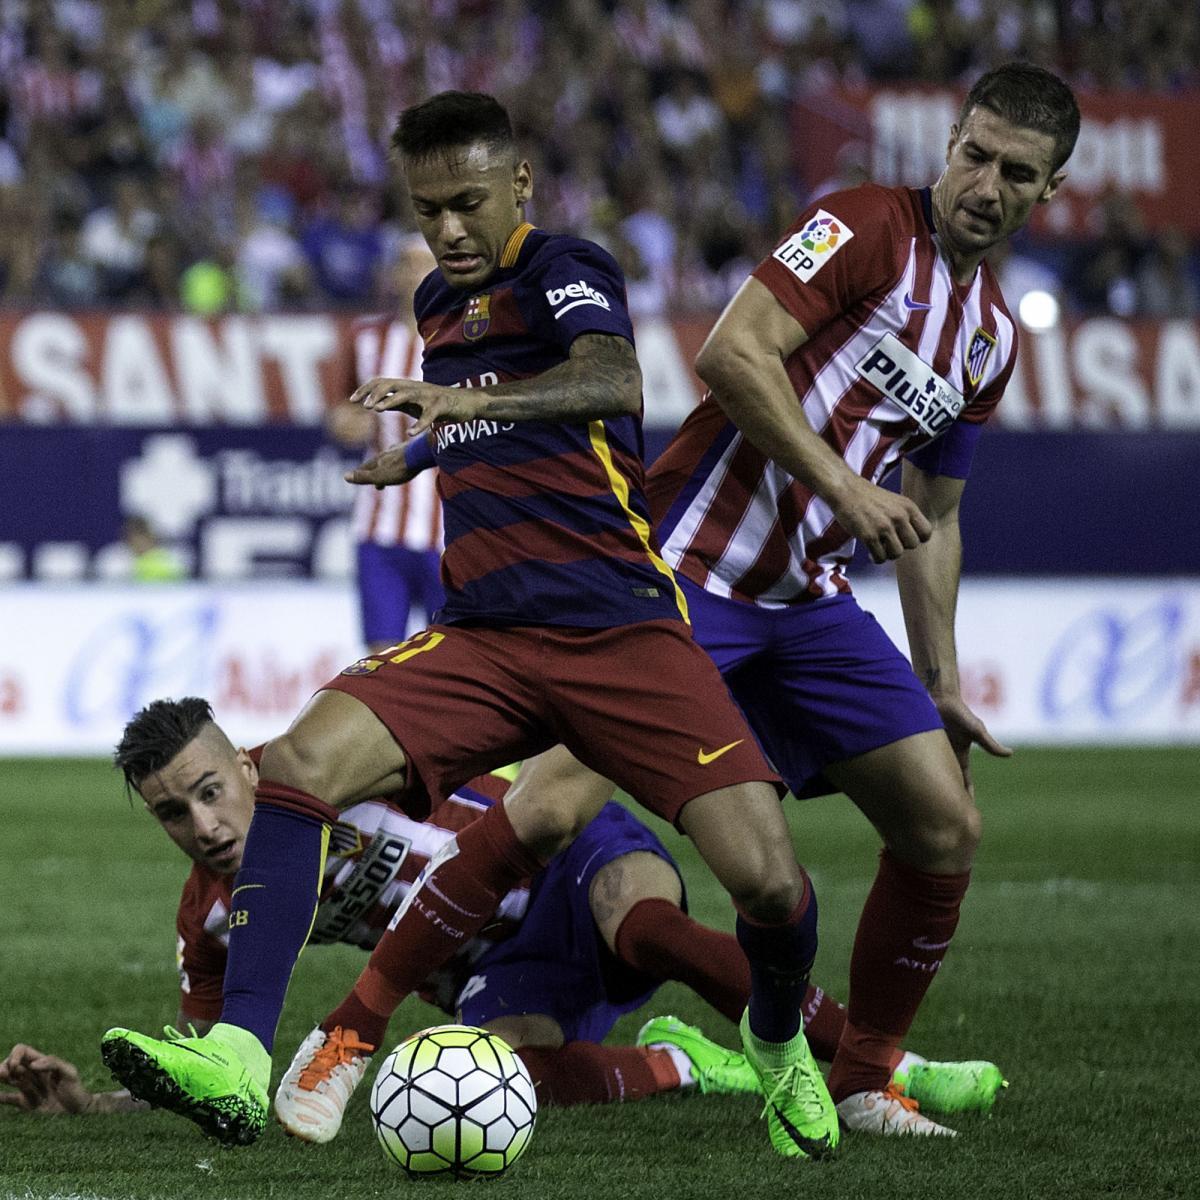 Arsenal Vs Barcelona Live Score Highlights From: Barcelona Vs. Atletico Madrid: Live Score, Highlights From